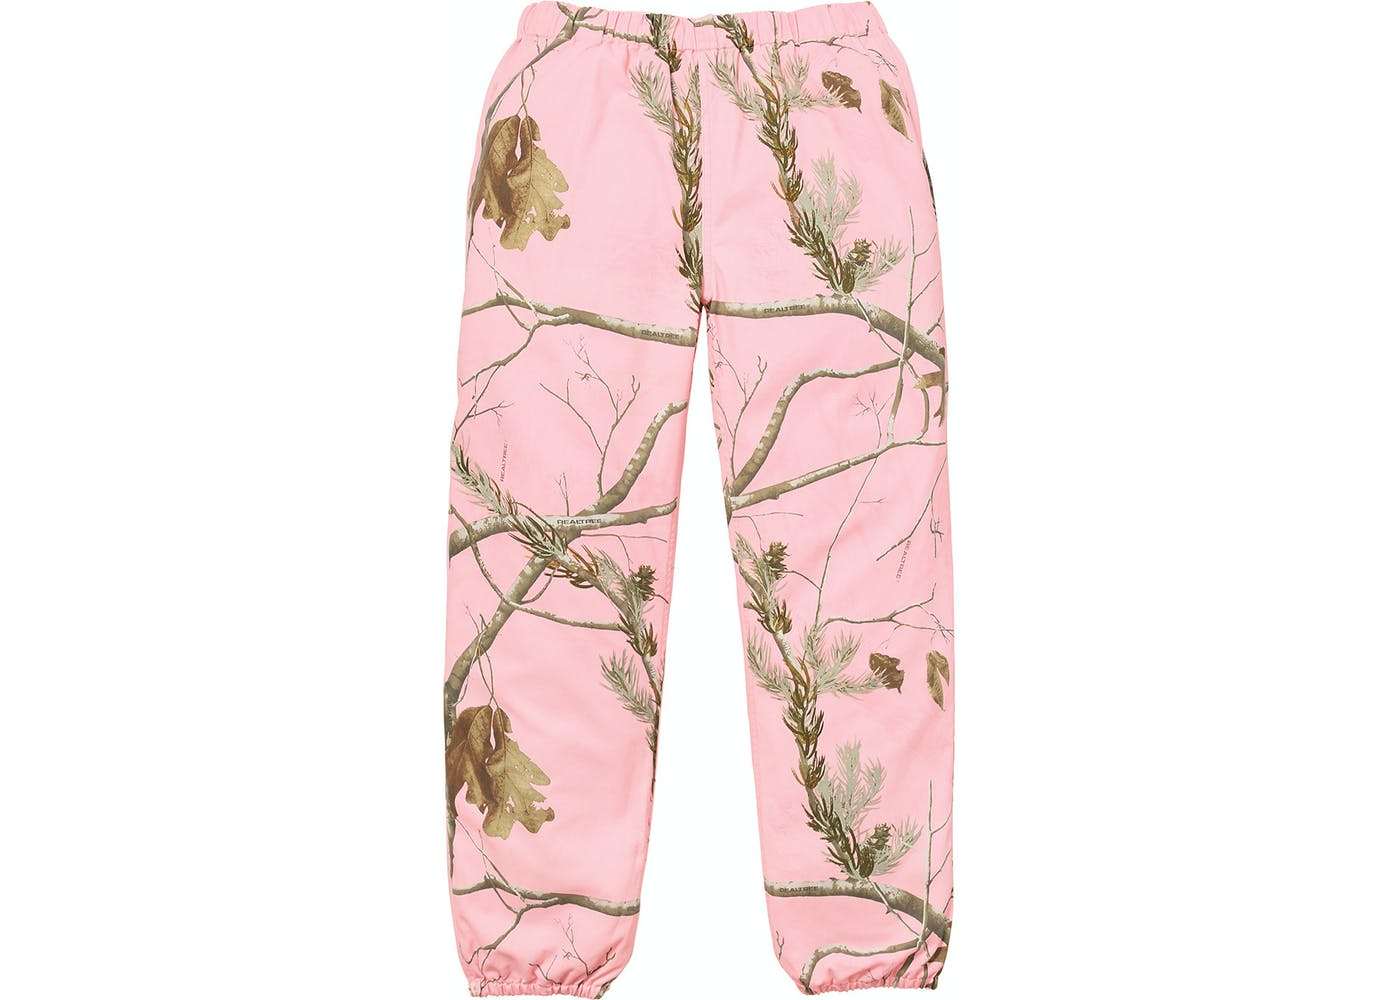 Supreme Realtree Camo Flannel Pant Pink